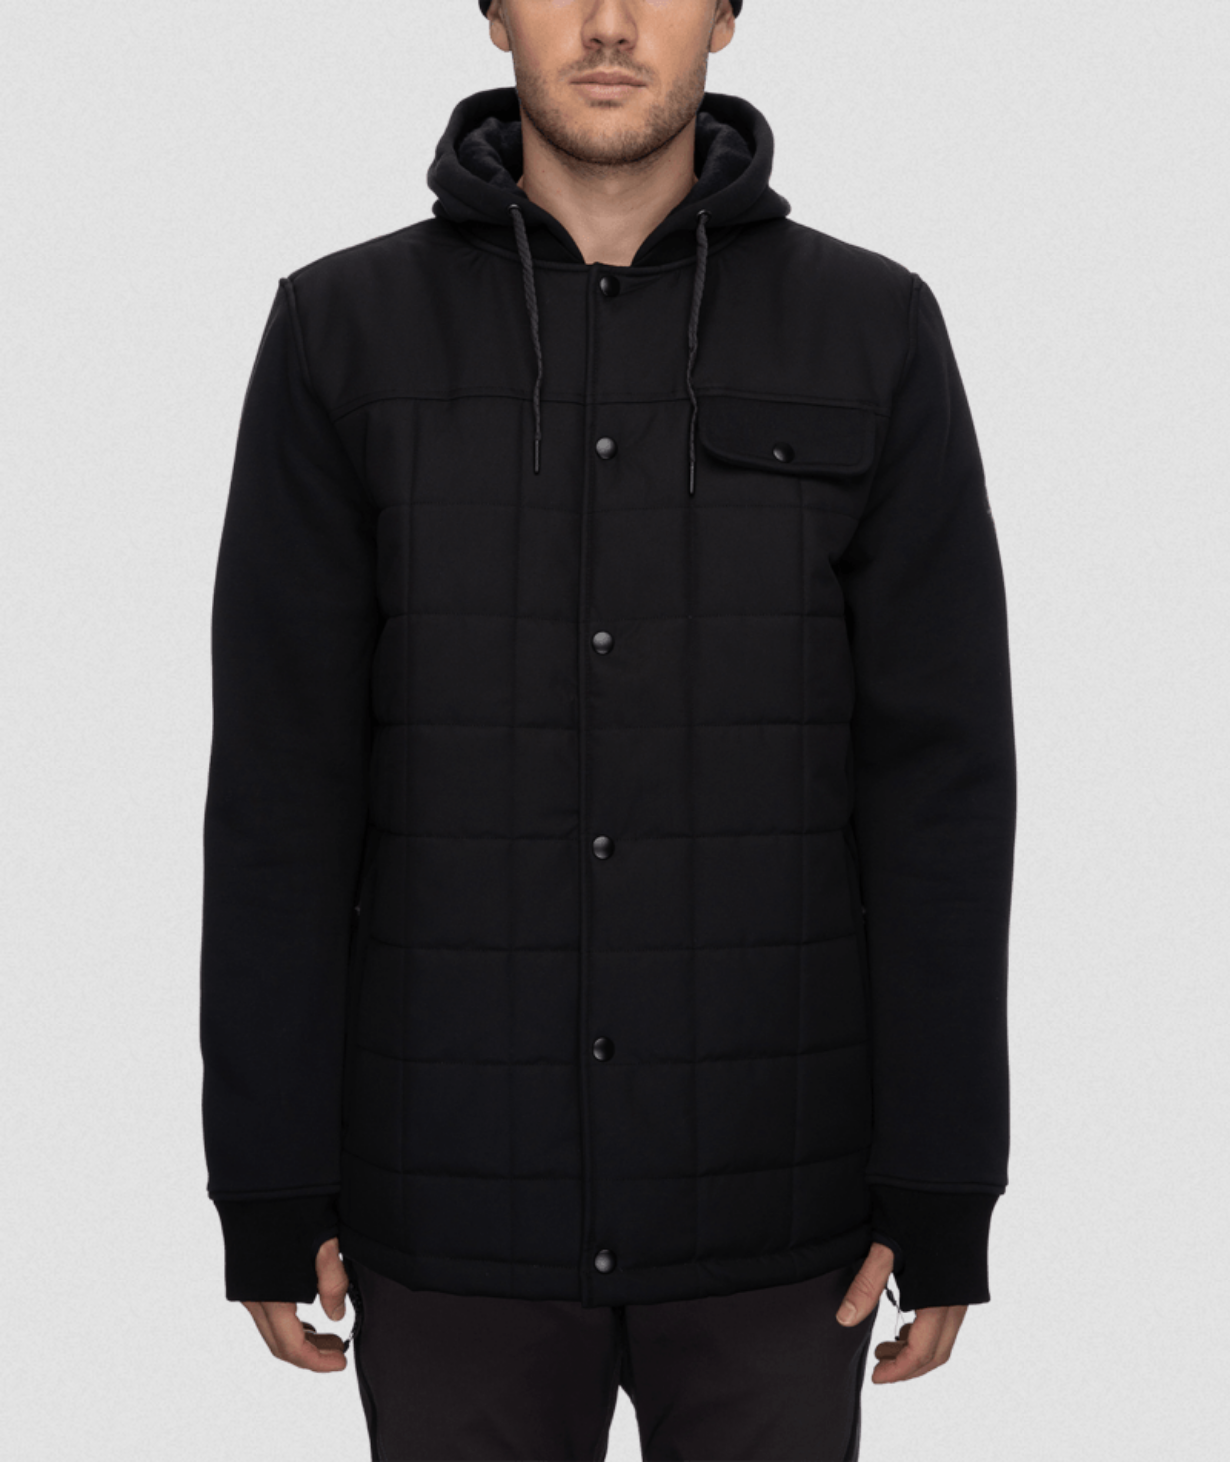 686 Men's Bedwin Insulated Jacket - Black